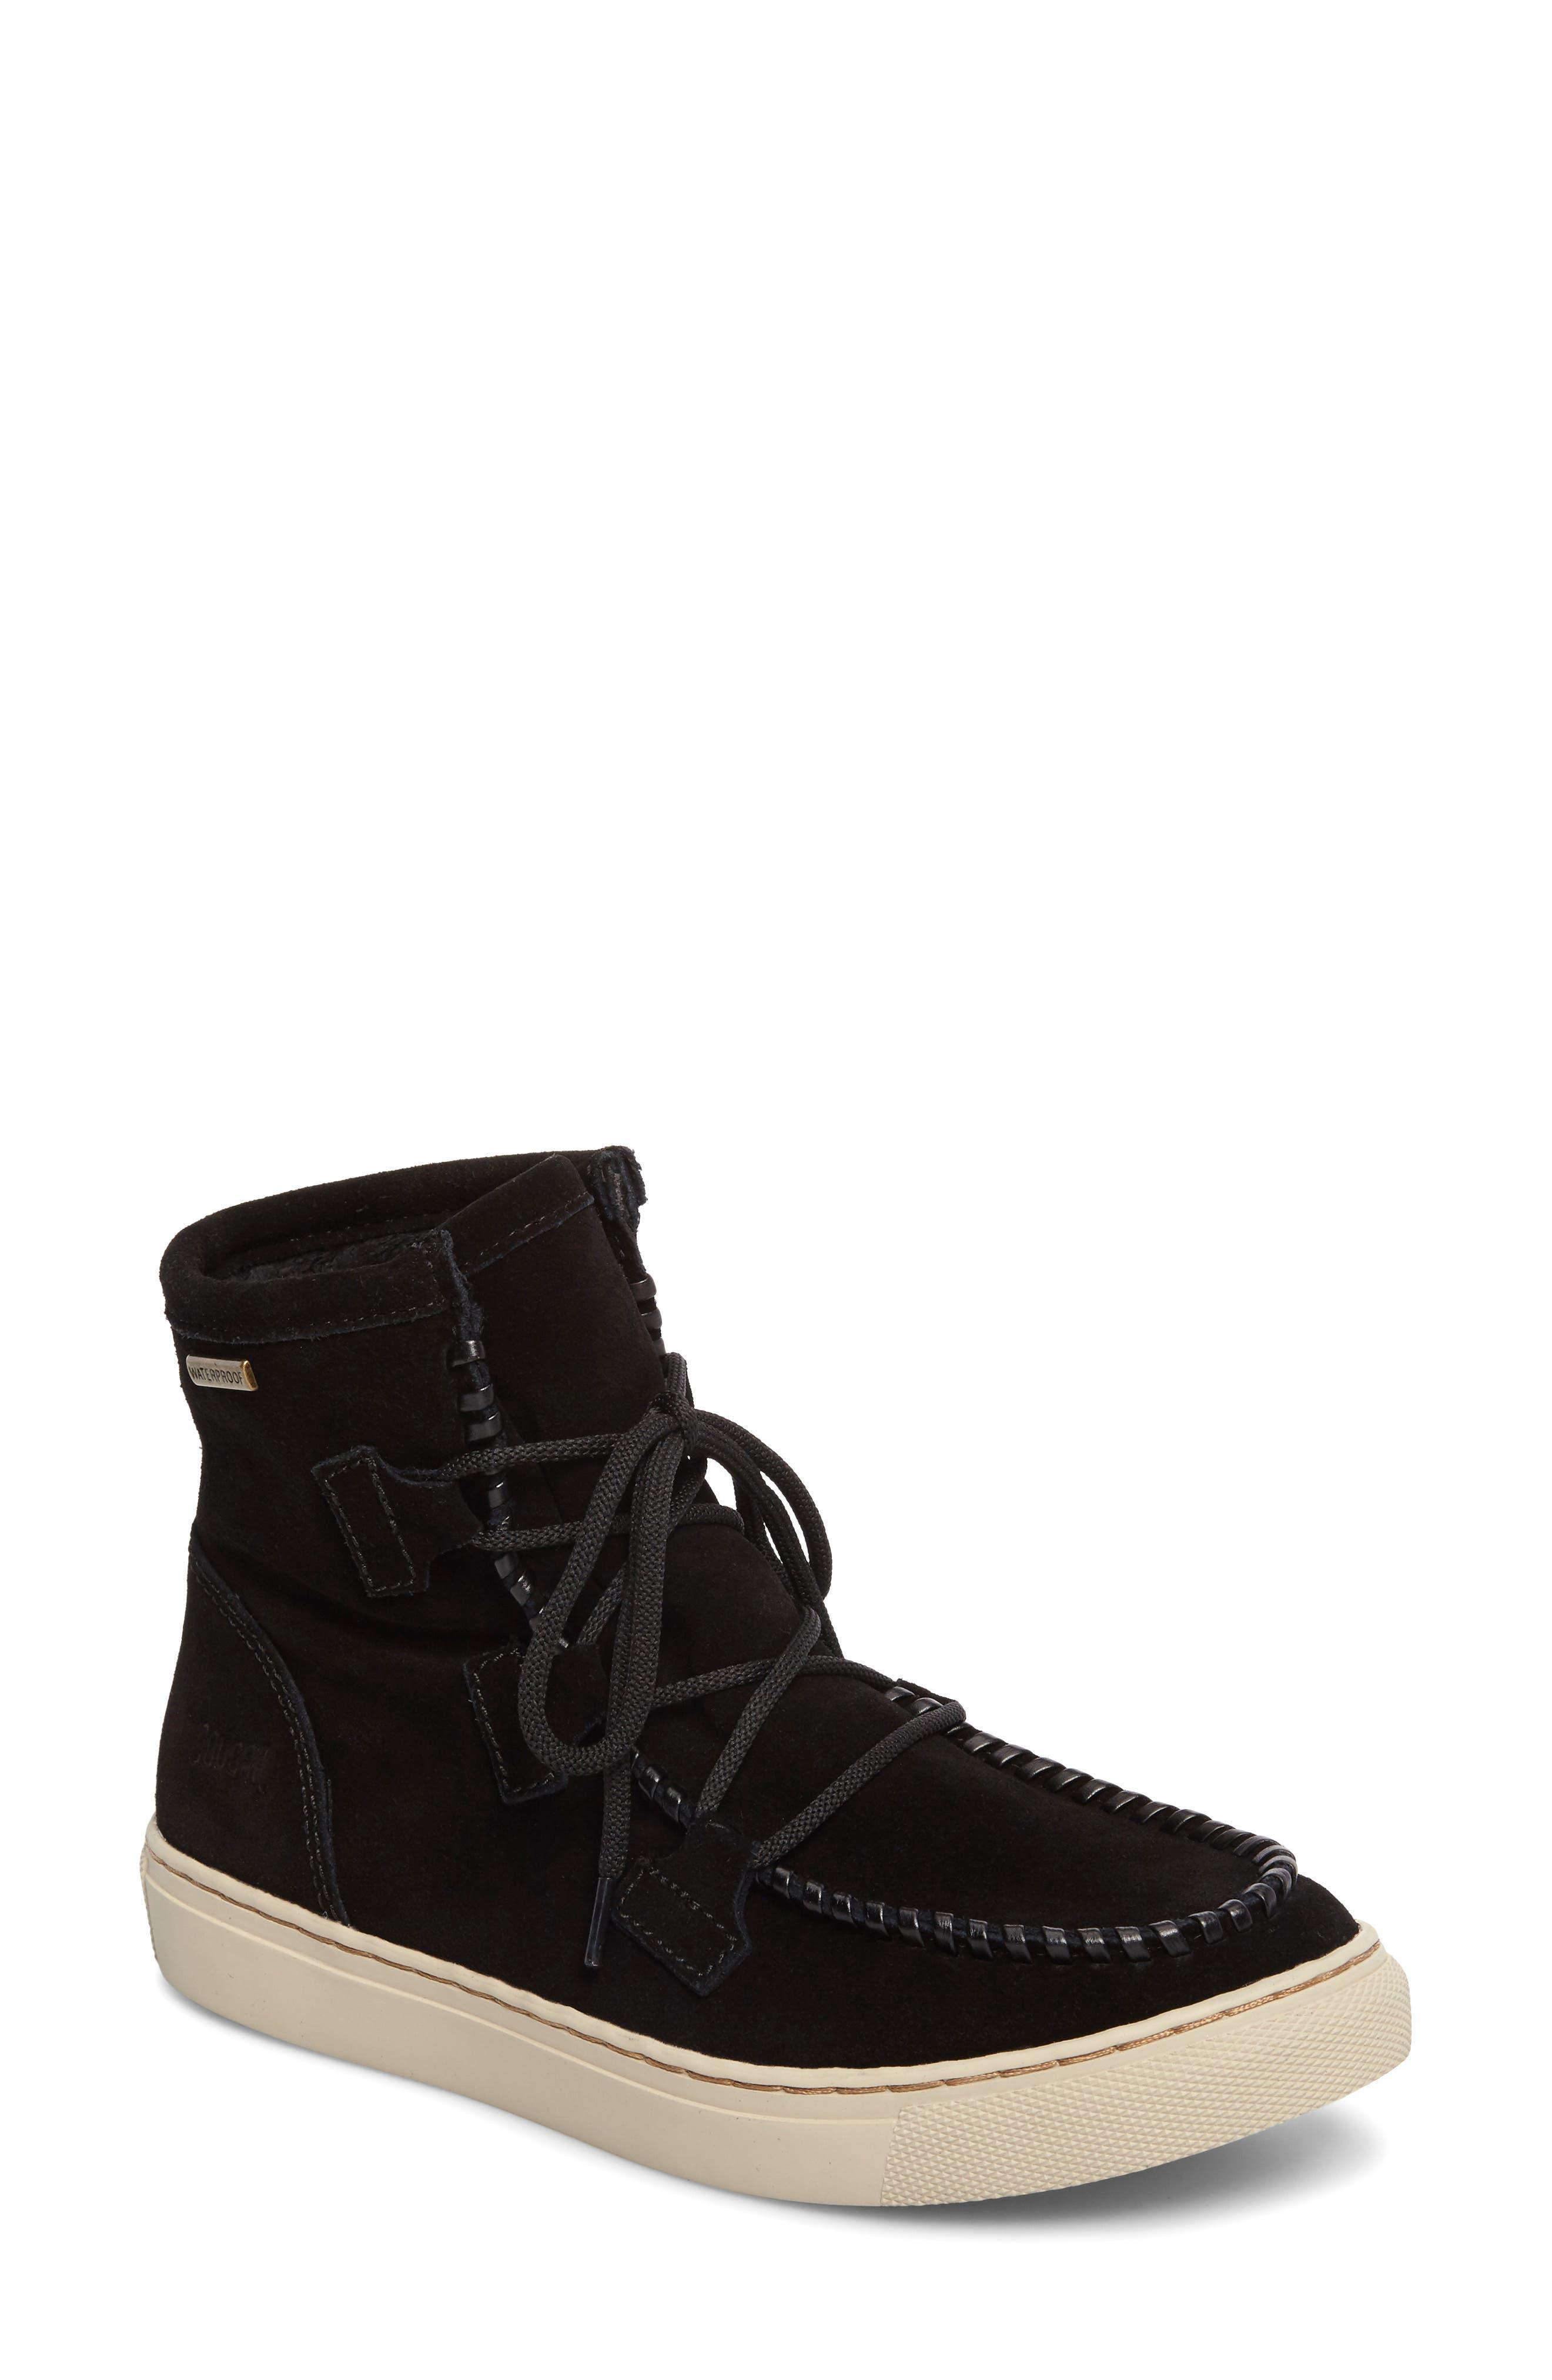 Fabiola Waterproof High Top Sneaker,                             Main thumbnail 1, color,                             BLACK SUEDE